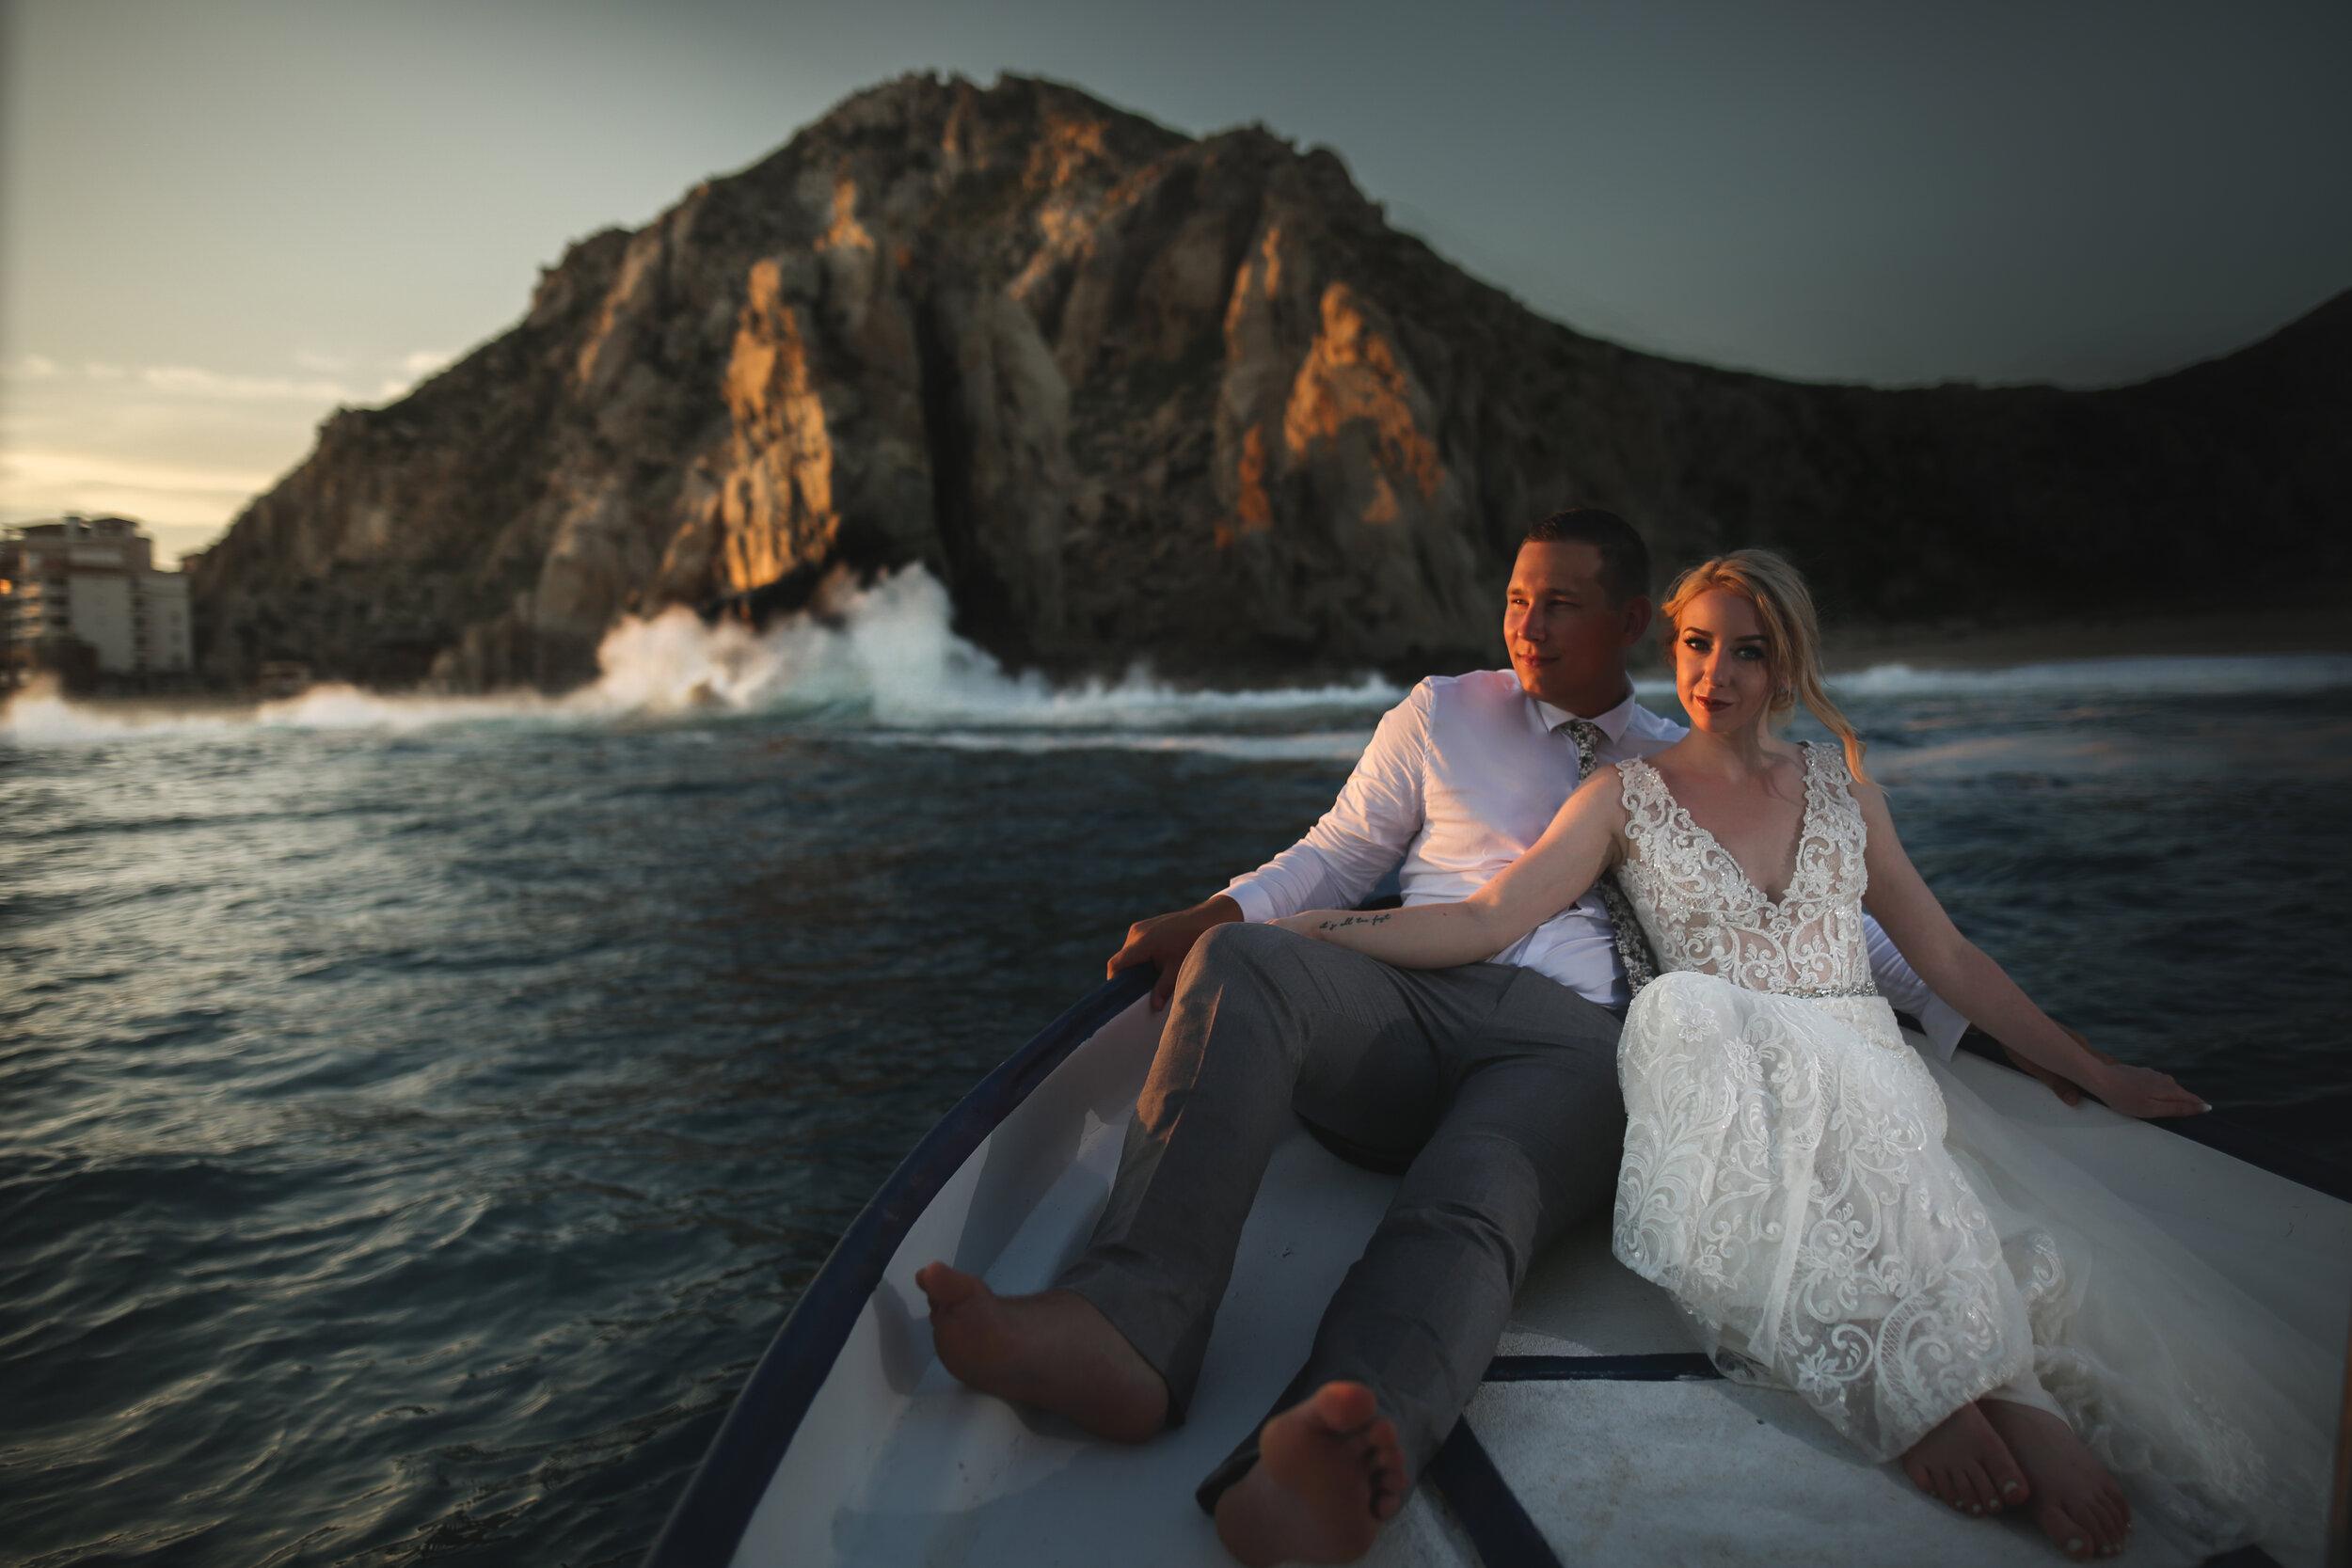 536-Adam-Ziorio-Photography-VictoriaBC-Weddings&Elopements.jpg